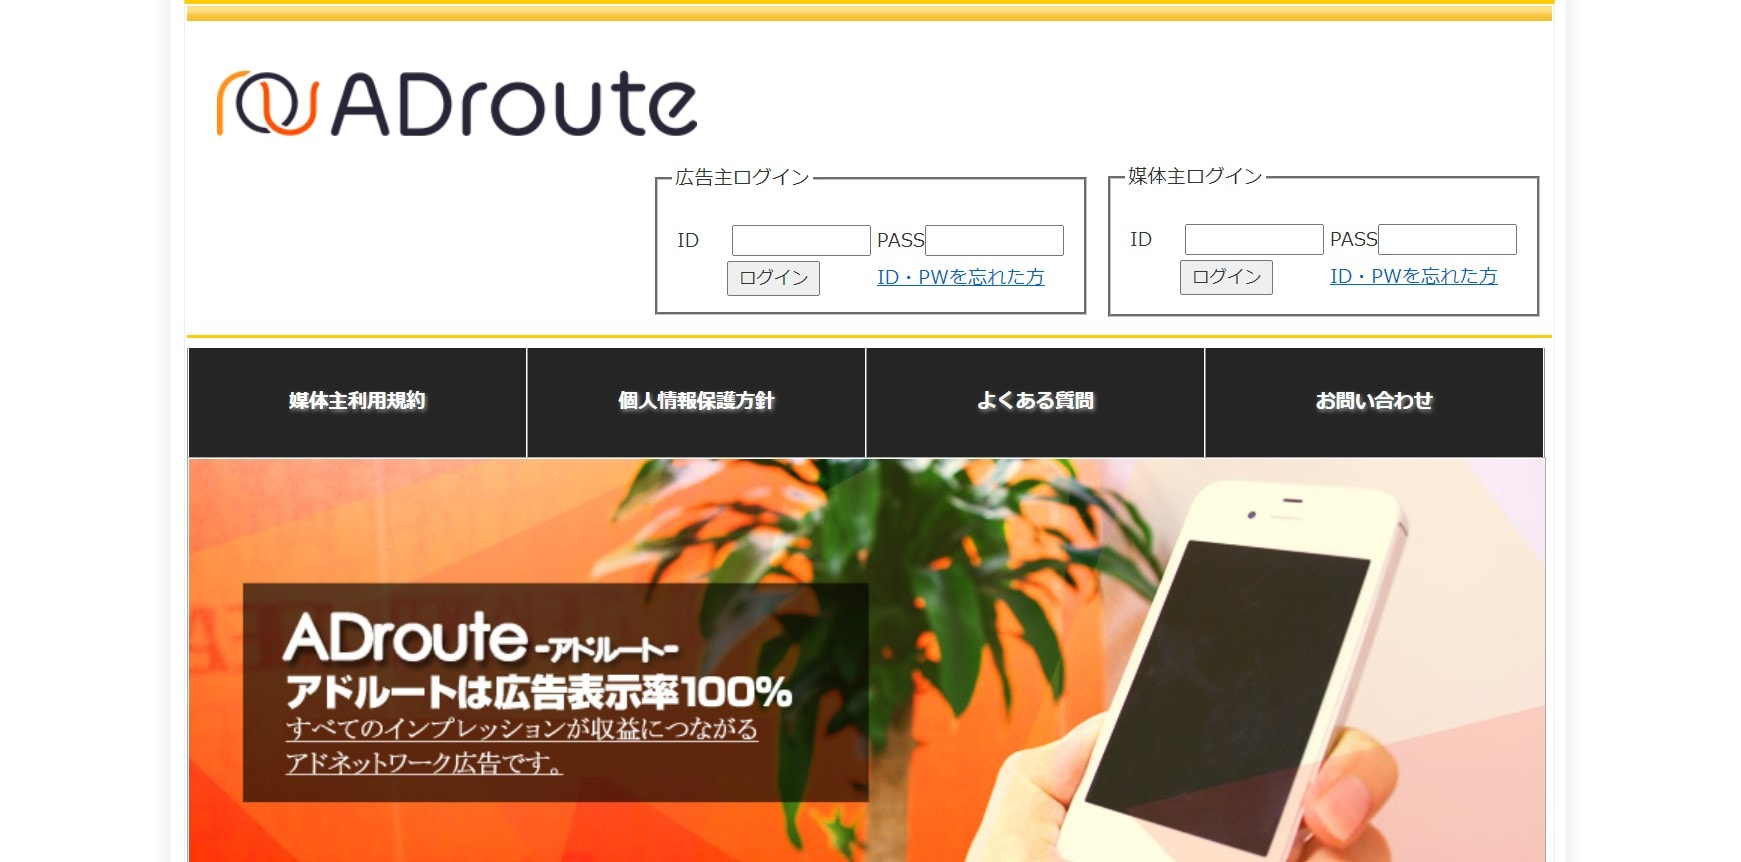 ADroute(アドルート)